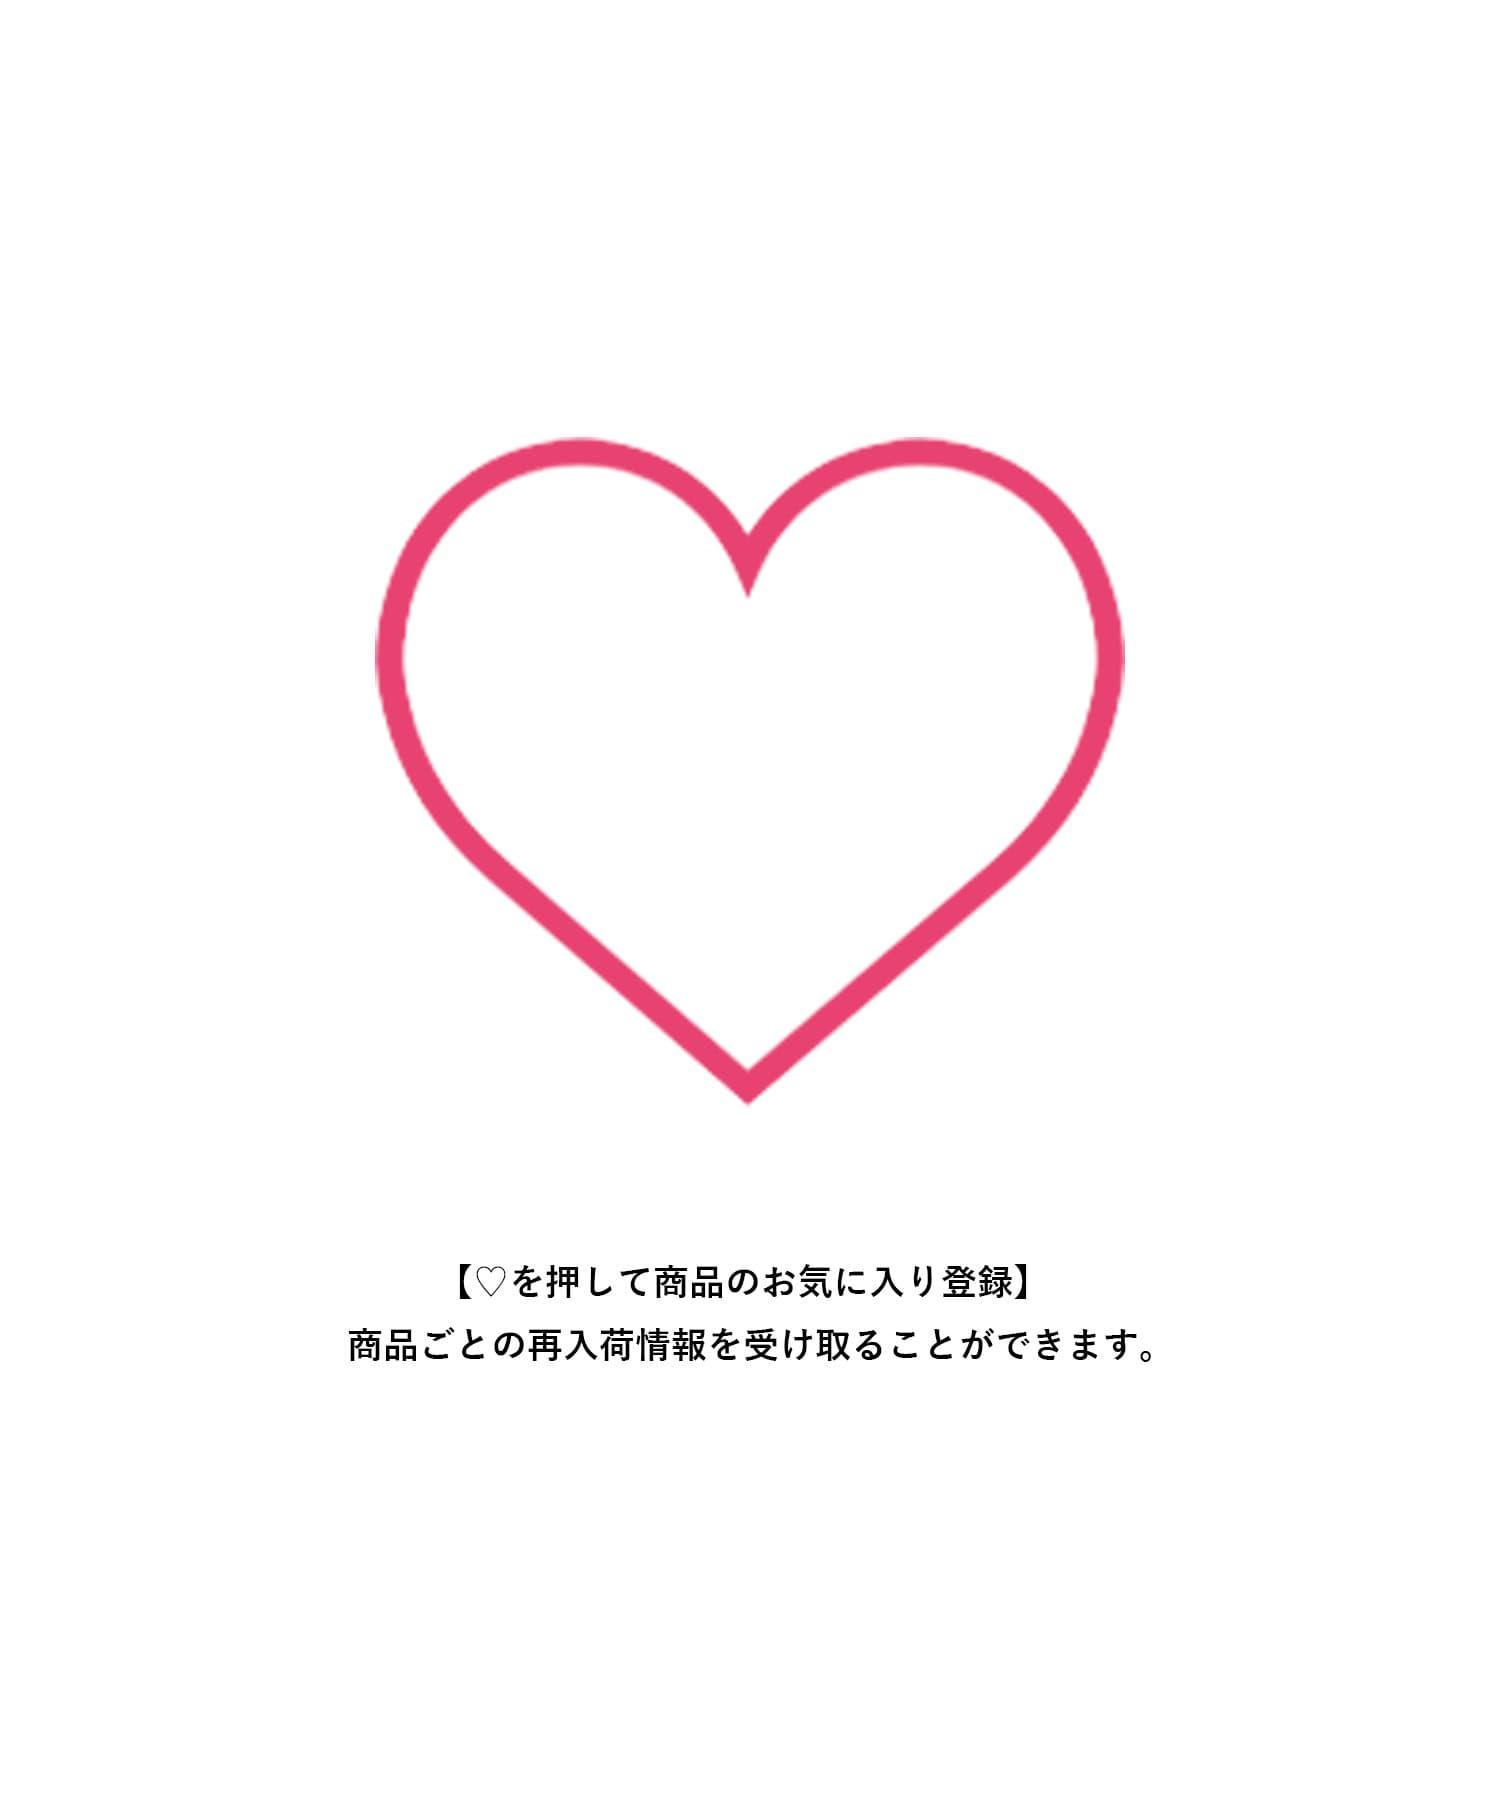 COLLAGE GALLARDAGALANTE(コラージュ ガリャルダガランテ) 【間のびしないバランス】フレンチスリーブチュニックTシャツ